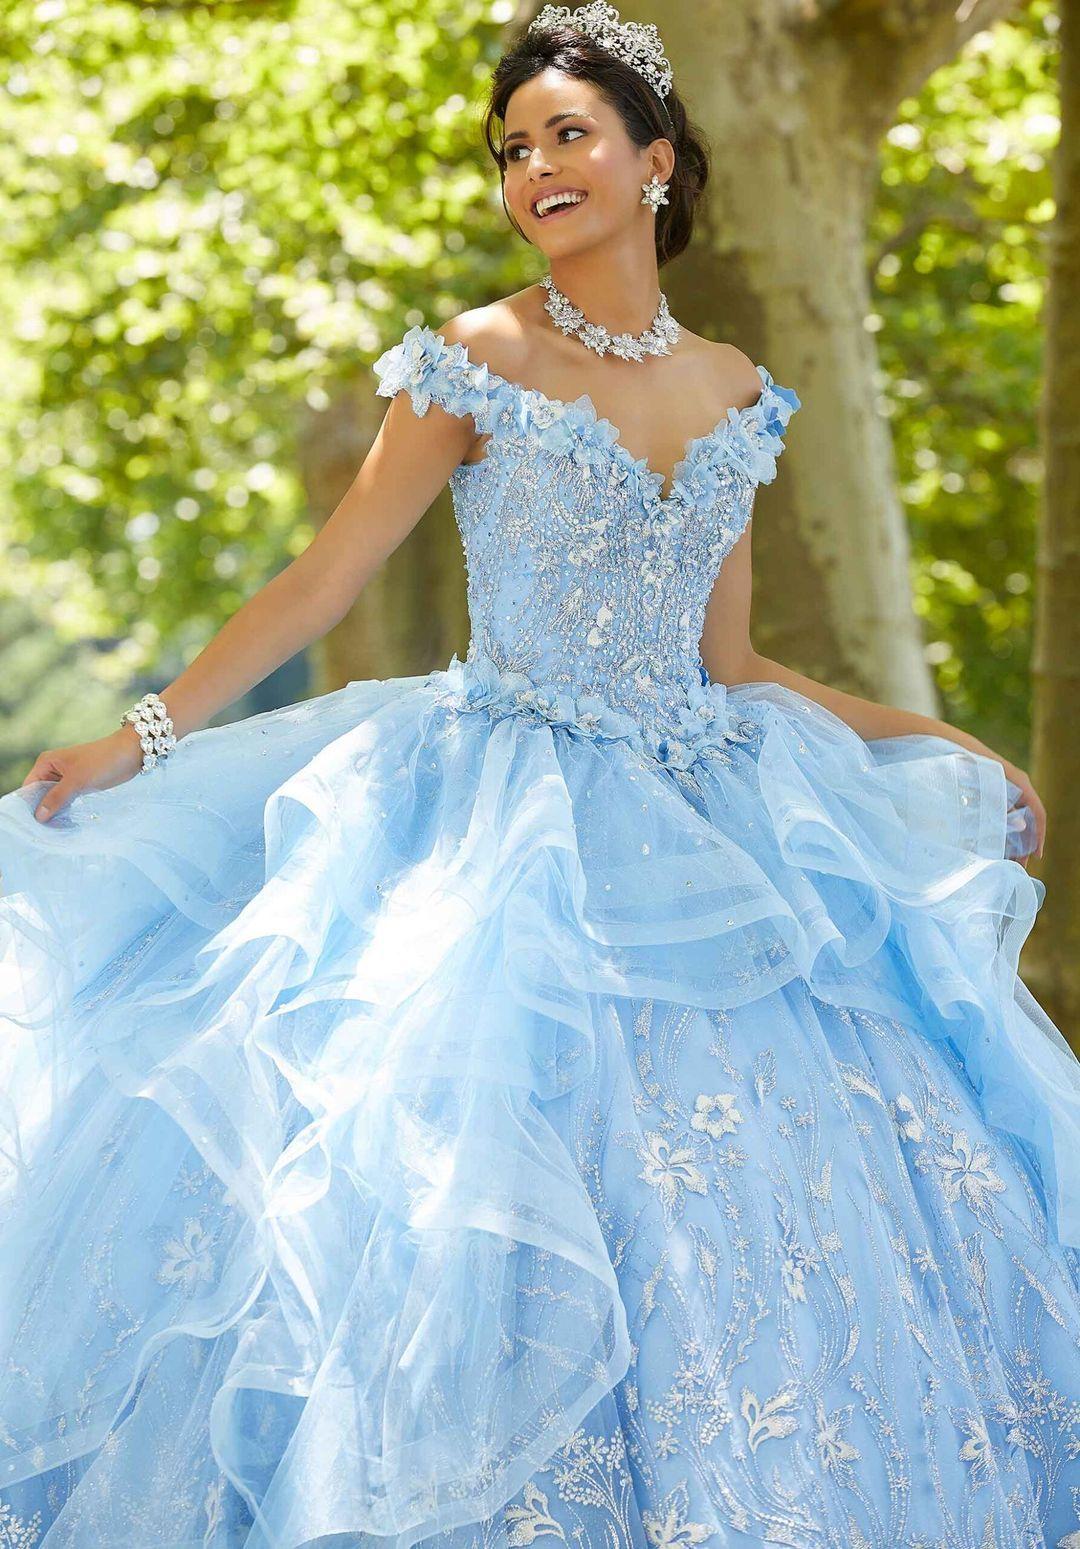 Ruffled Quinceanera Dress By Mori Lee Vizcaya 89303 In 2021 Quinceanera Dresses Light Blue Quinceanera Dresses Pretty Quinceanera Dresses [ 1549 x 1080 Pixel ]